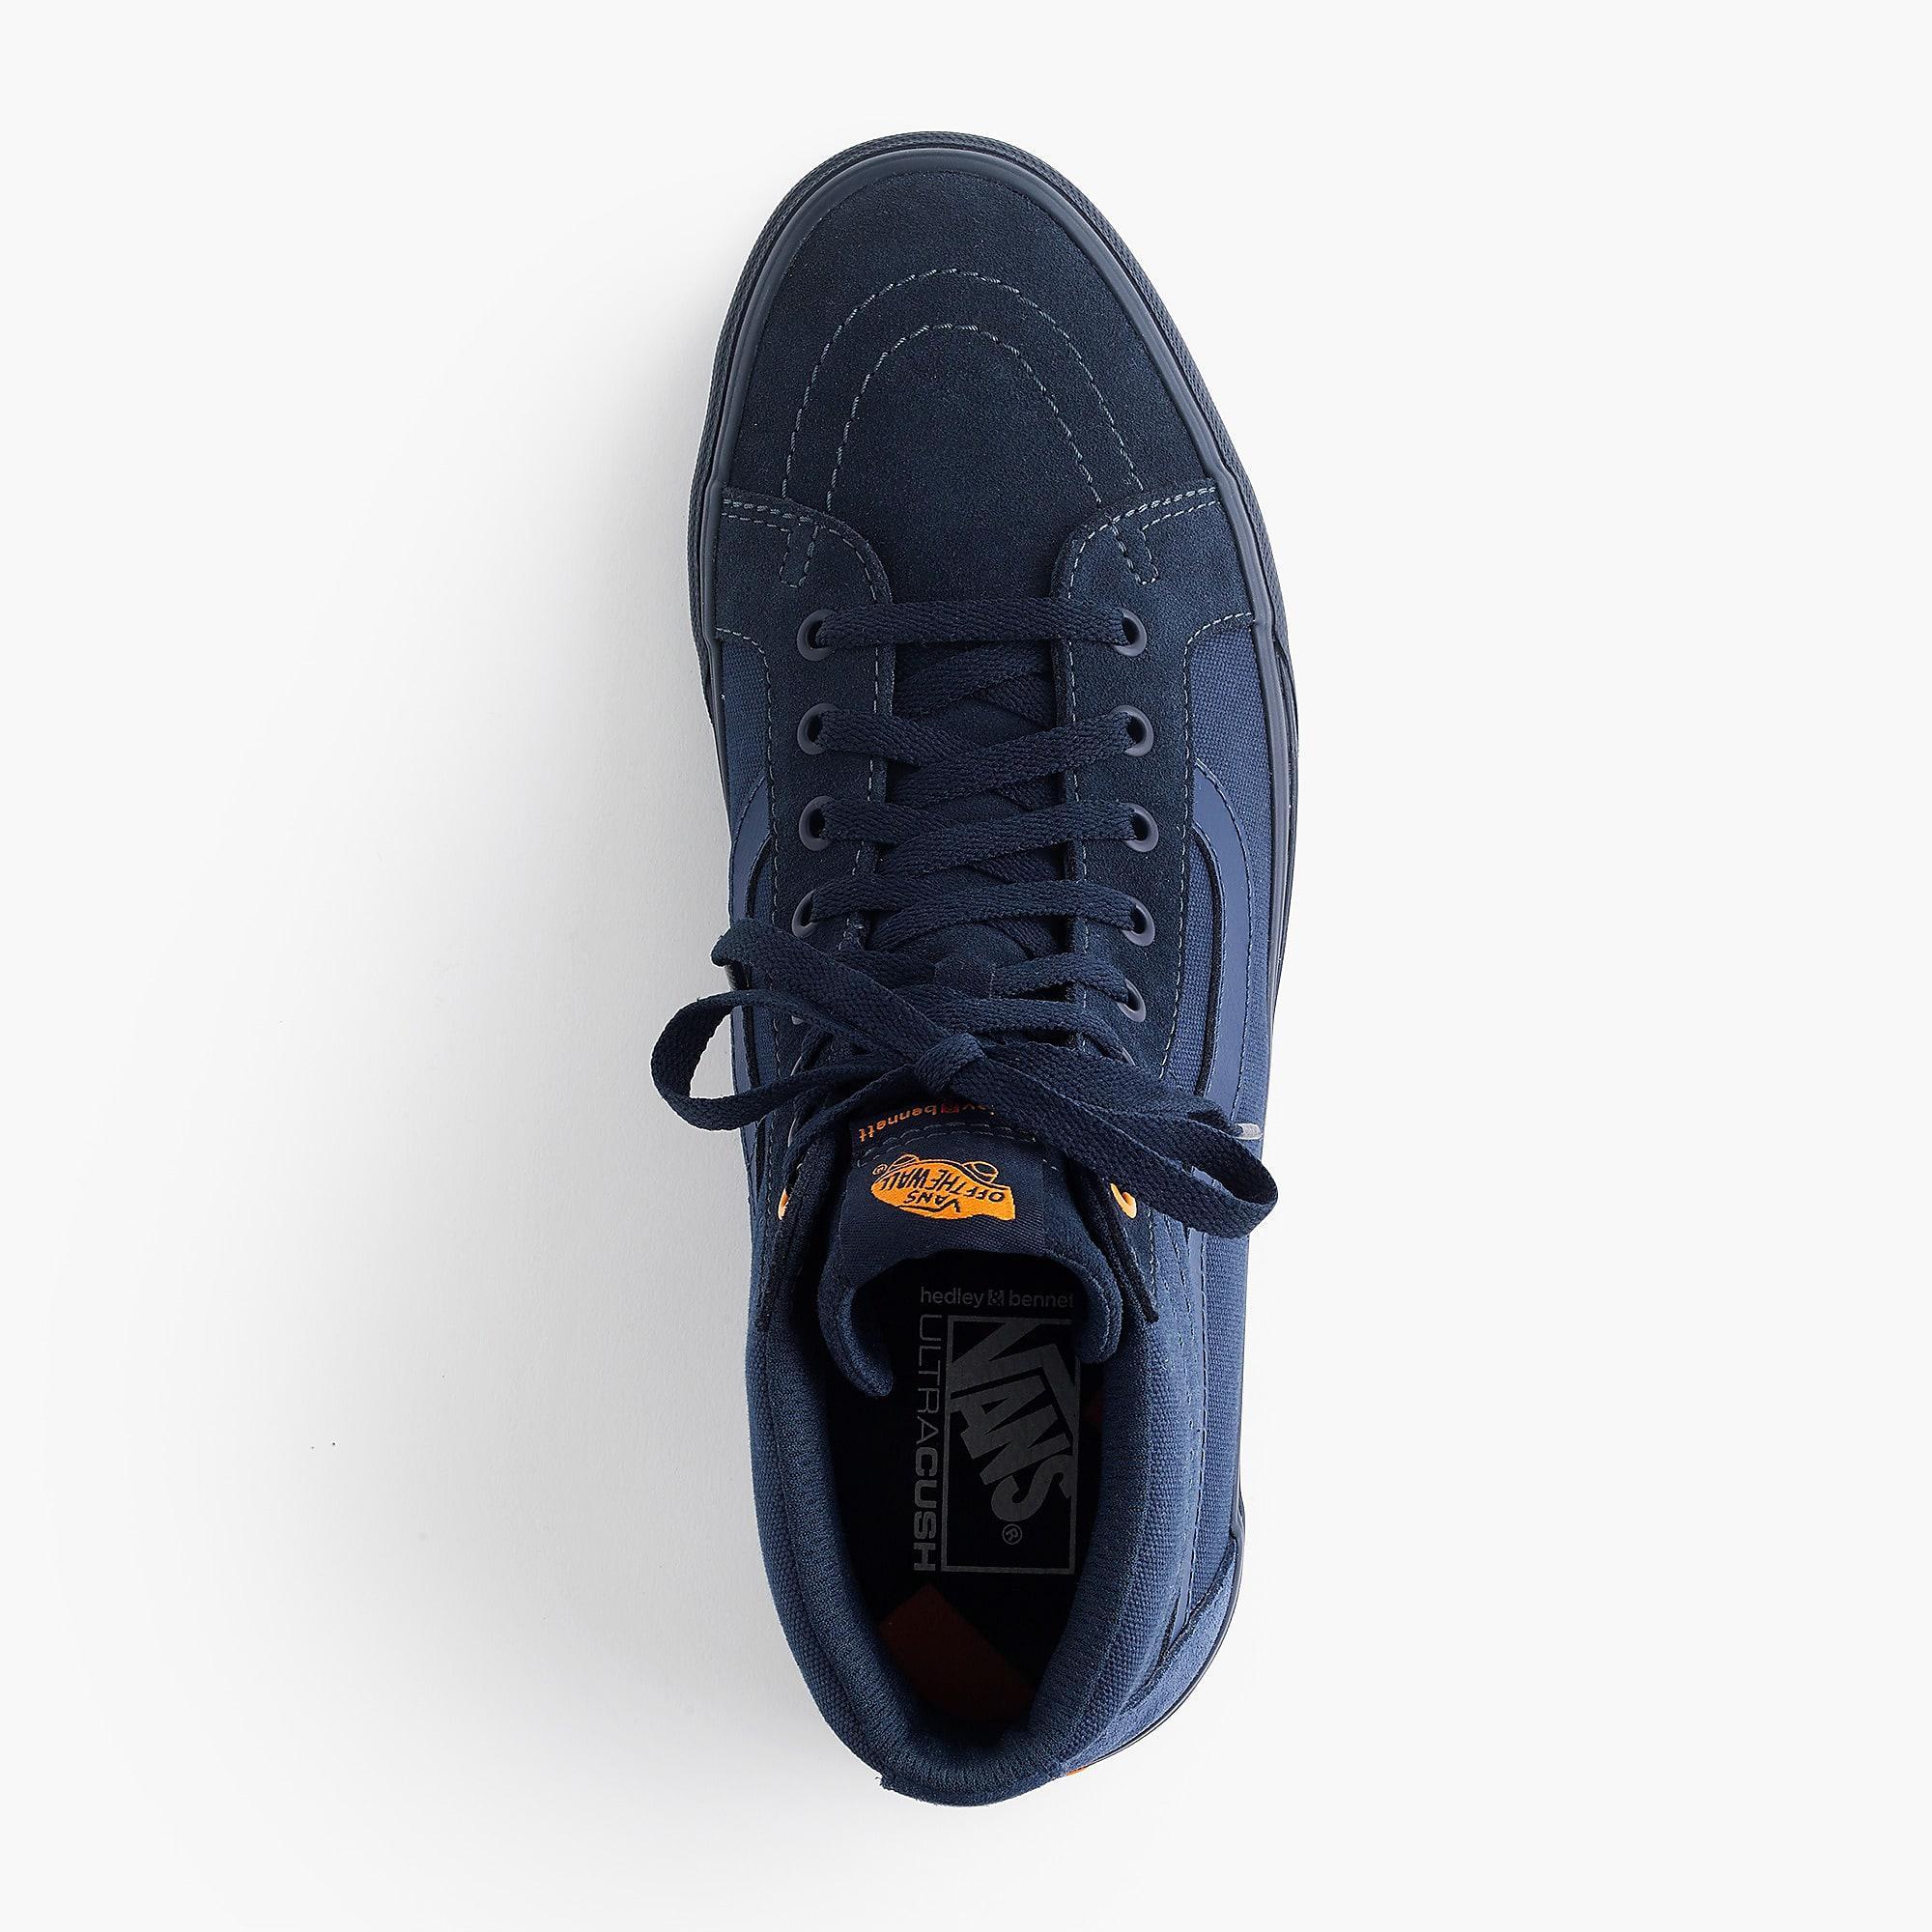 cdbab99f13f583 Vans. Men s Blue X Hedley   Bennett Sk8 Hi Sneakers.  90 From J.Crew